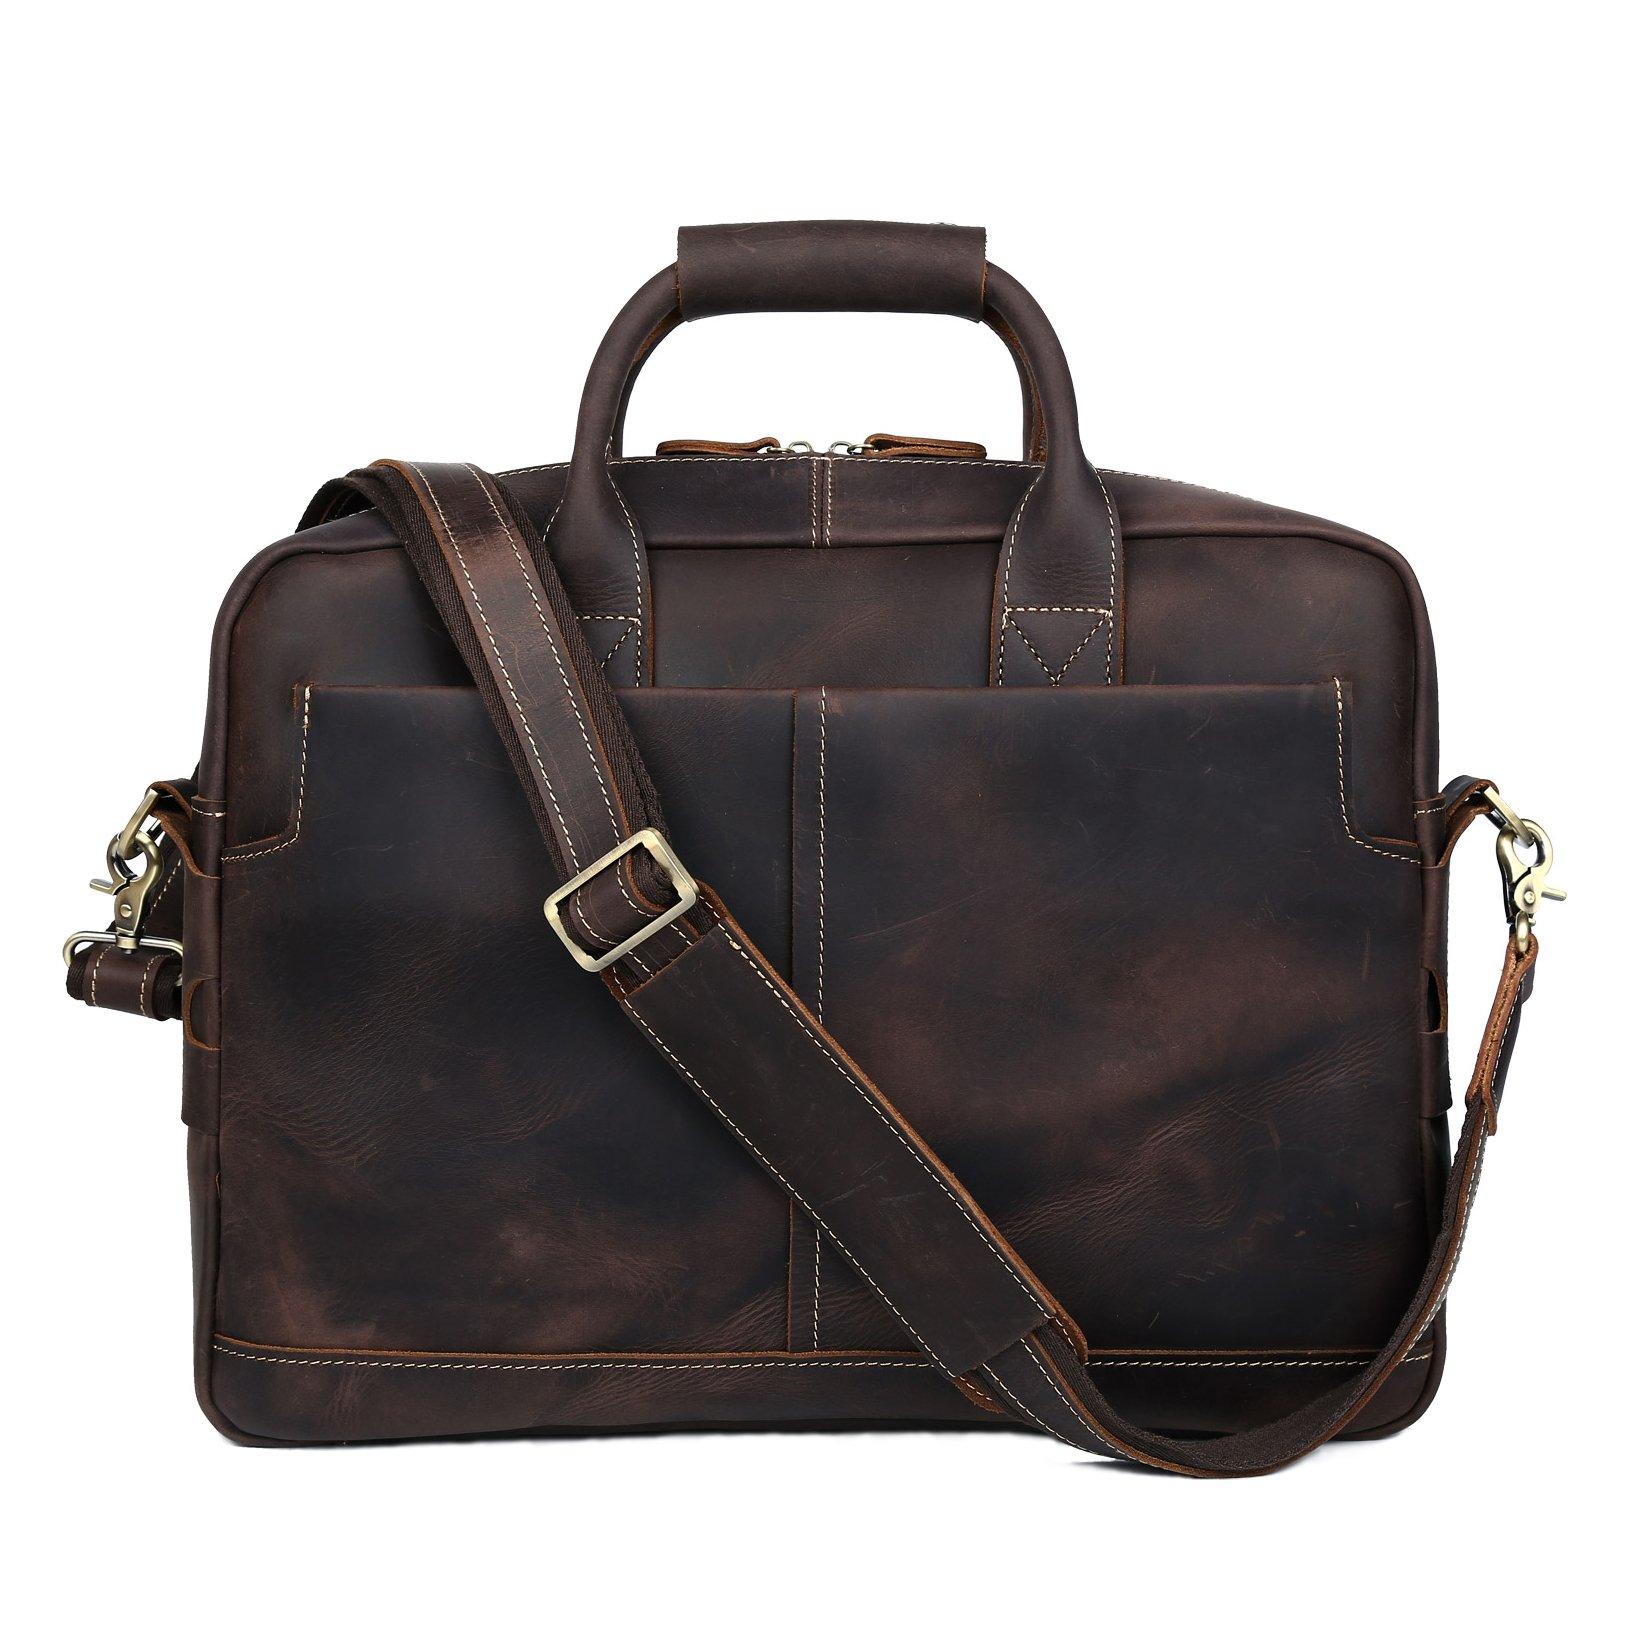 BAIGIO Men Retro Leather Briefcase Laptop Computer Office Business Shoulder Tote Messenger Bag (Dark Brown) by BAIGIO (Image #2)